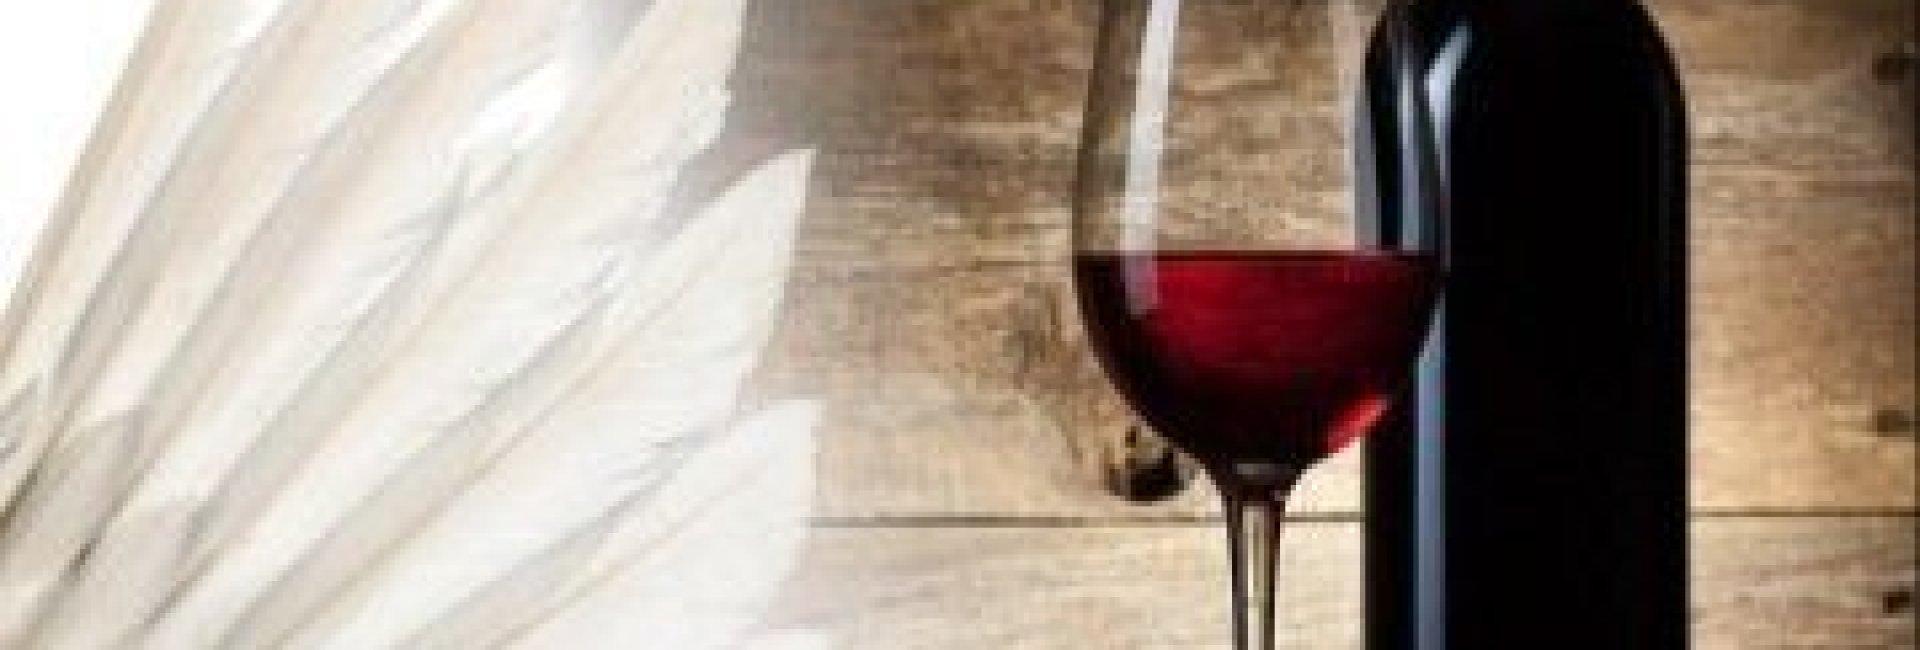 Młode wino i gęsina